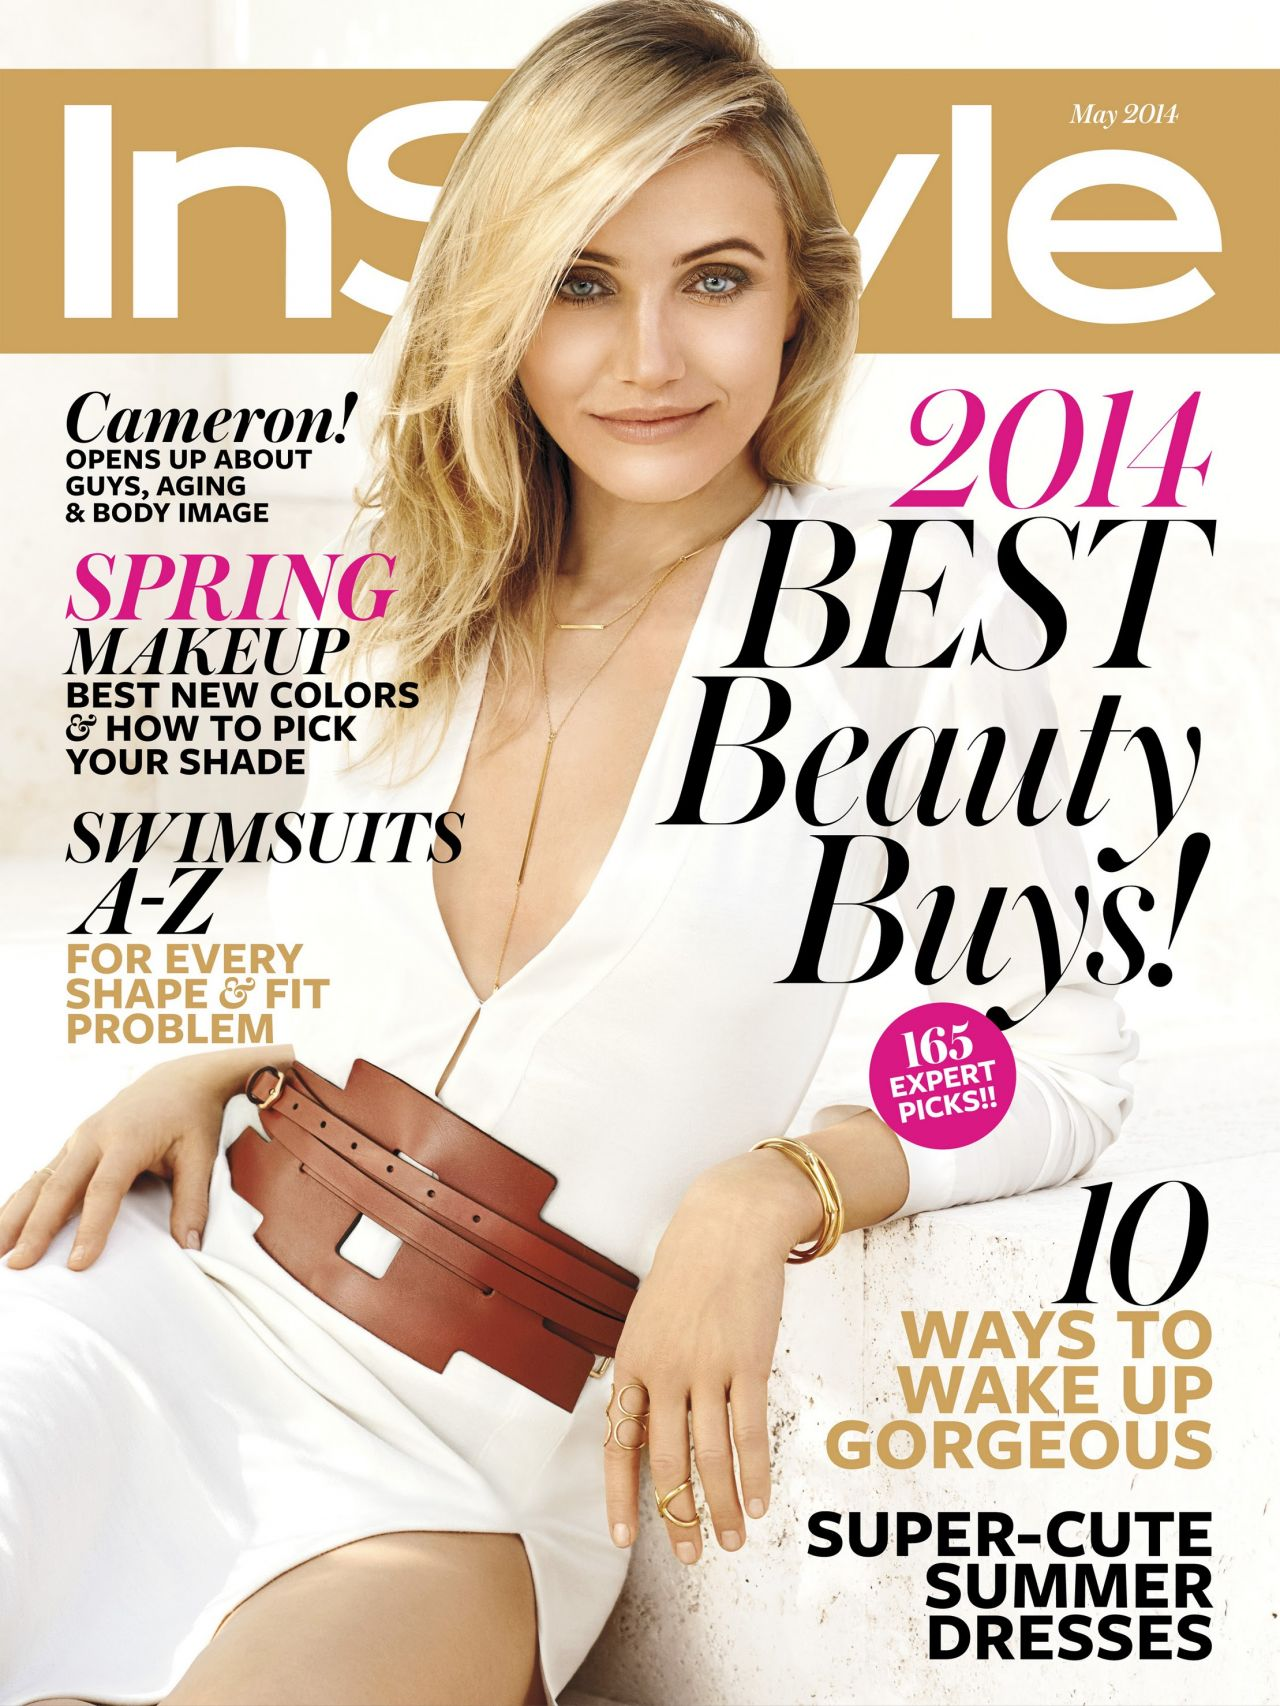 Julianne Moore Covers InStyle October 2013 in Calvin Klein